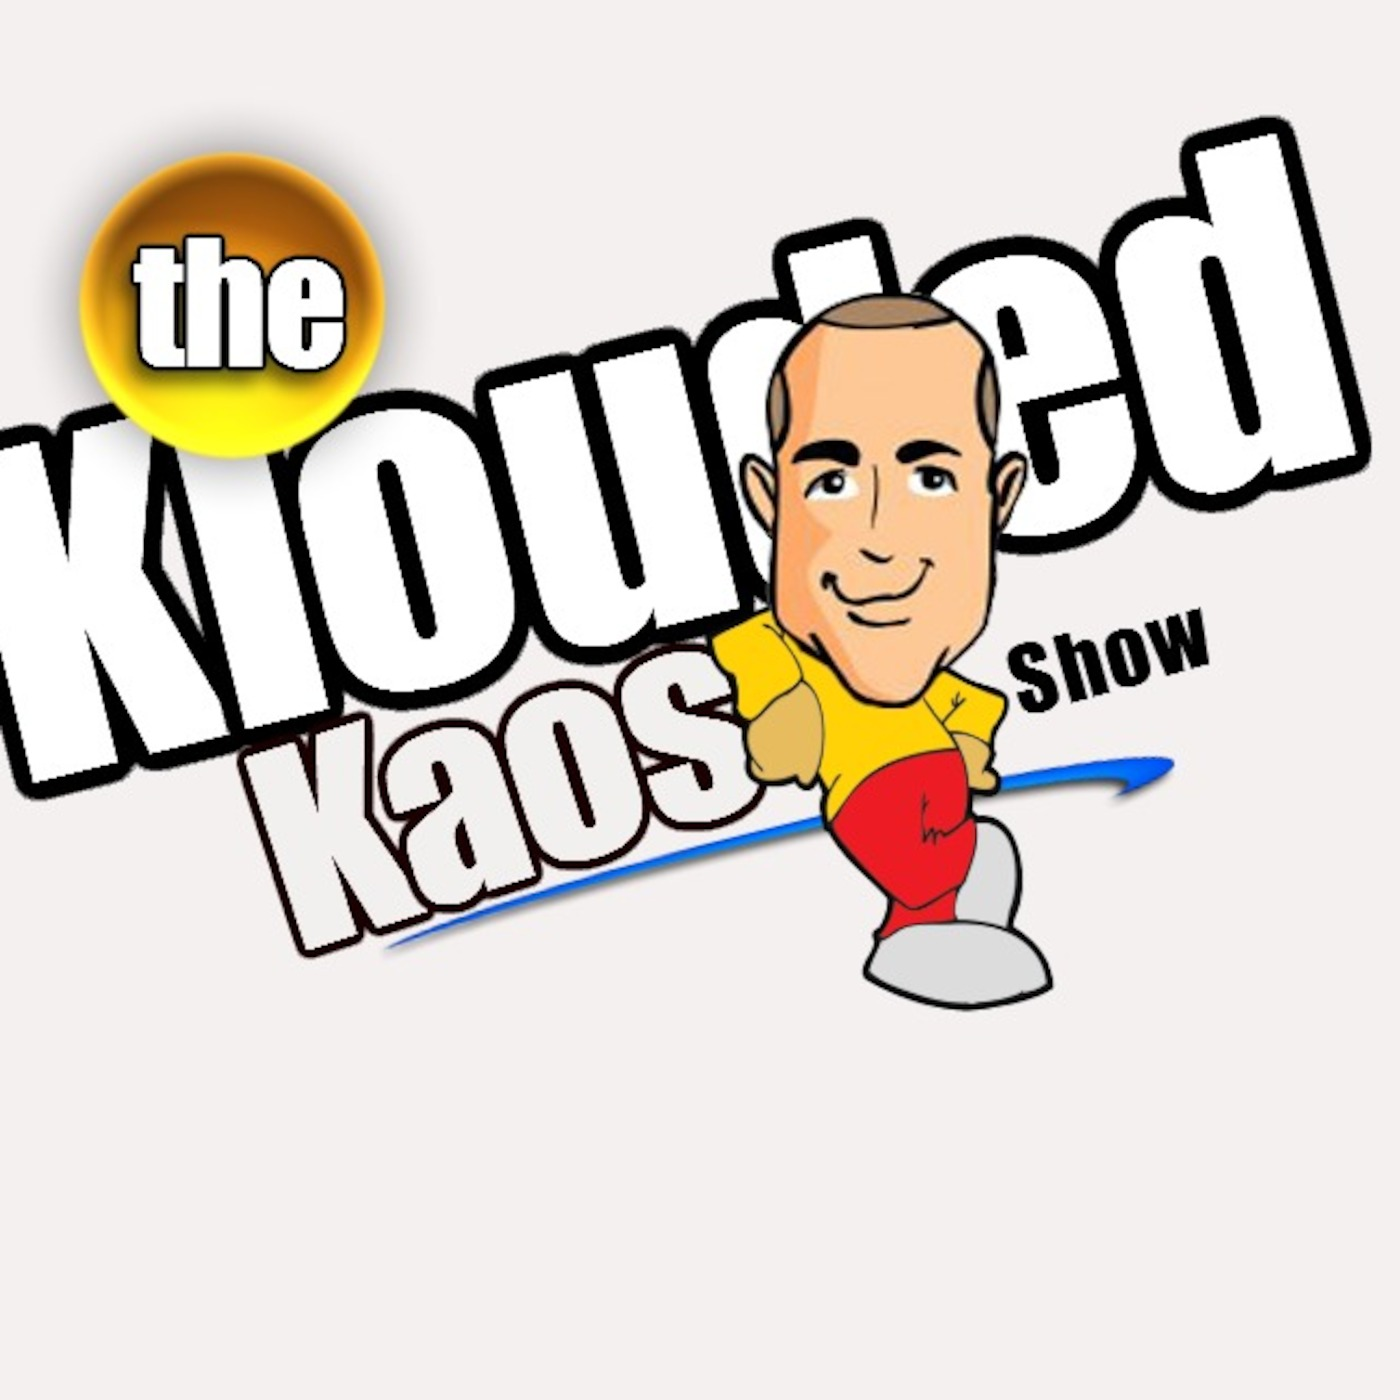 The Klouded Kaos Show